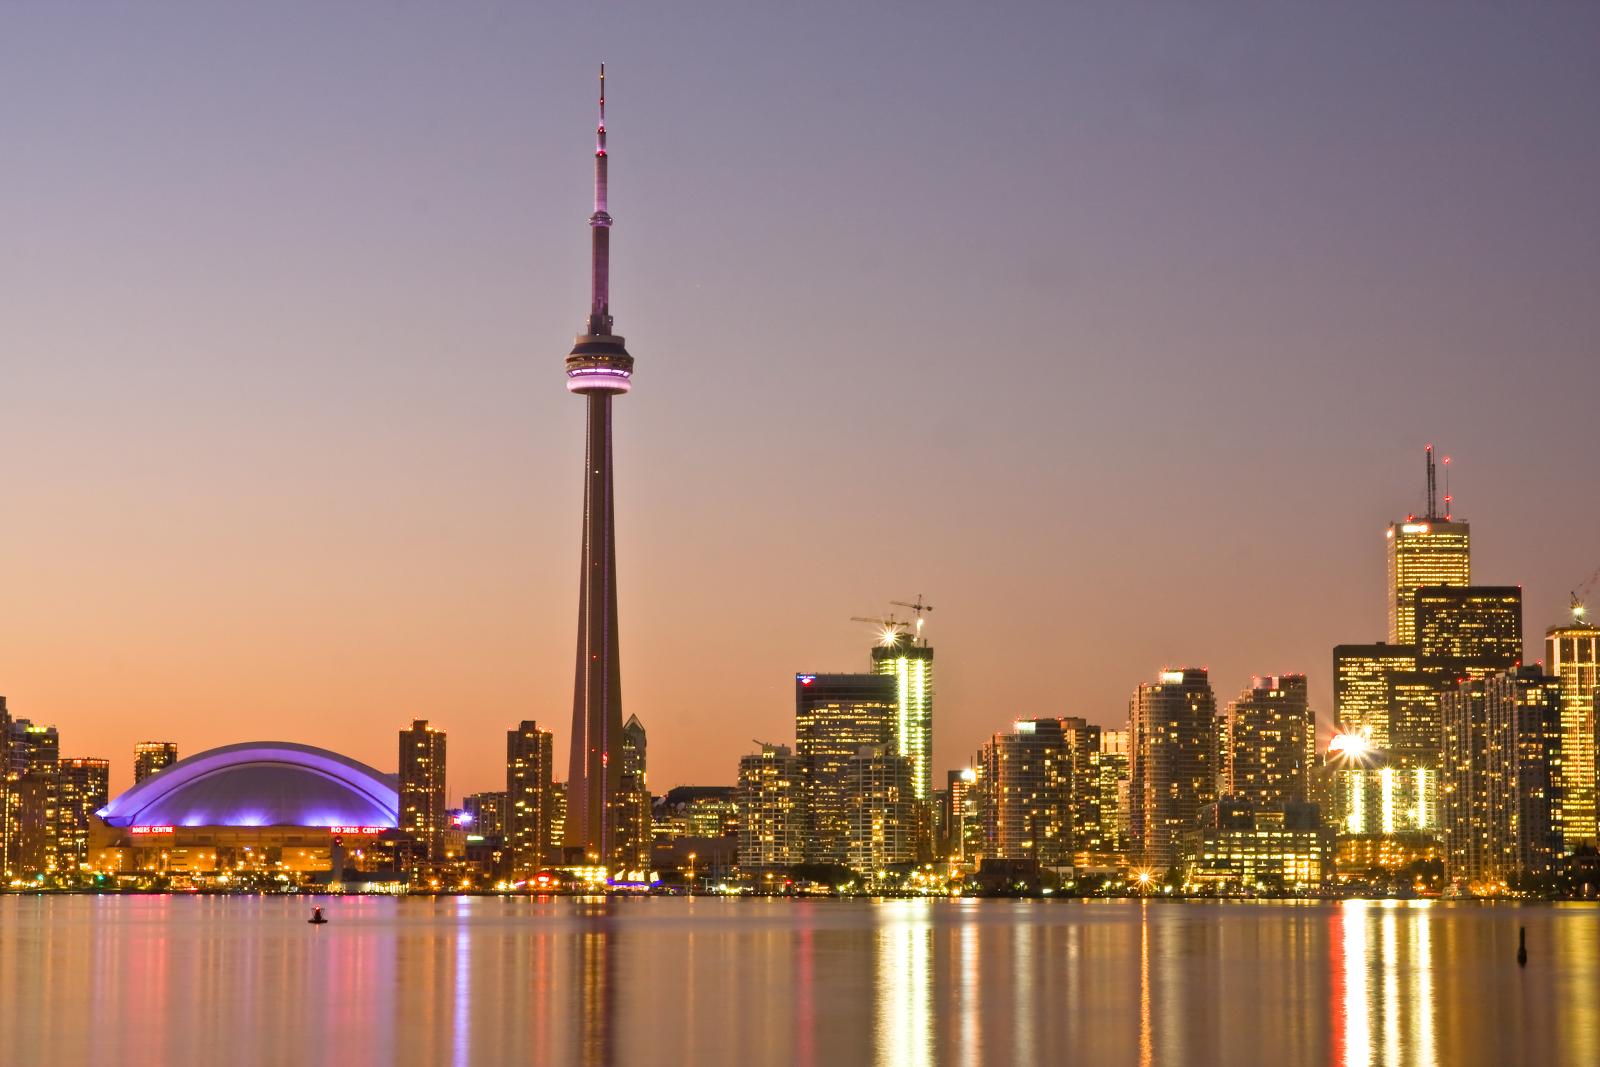 Canada Niagara falls skyline needle